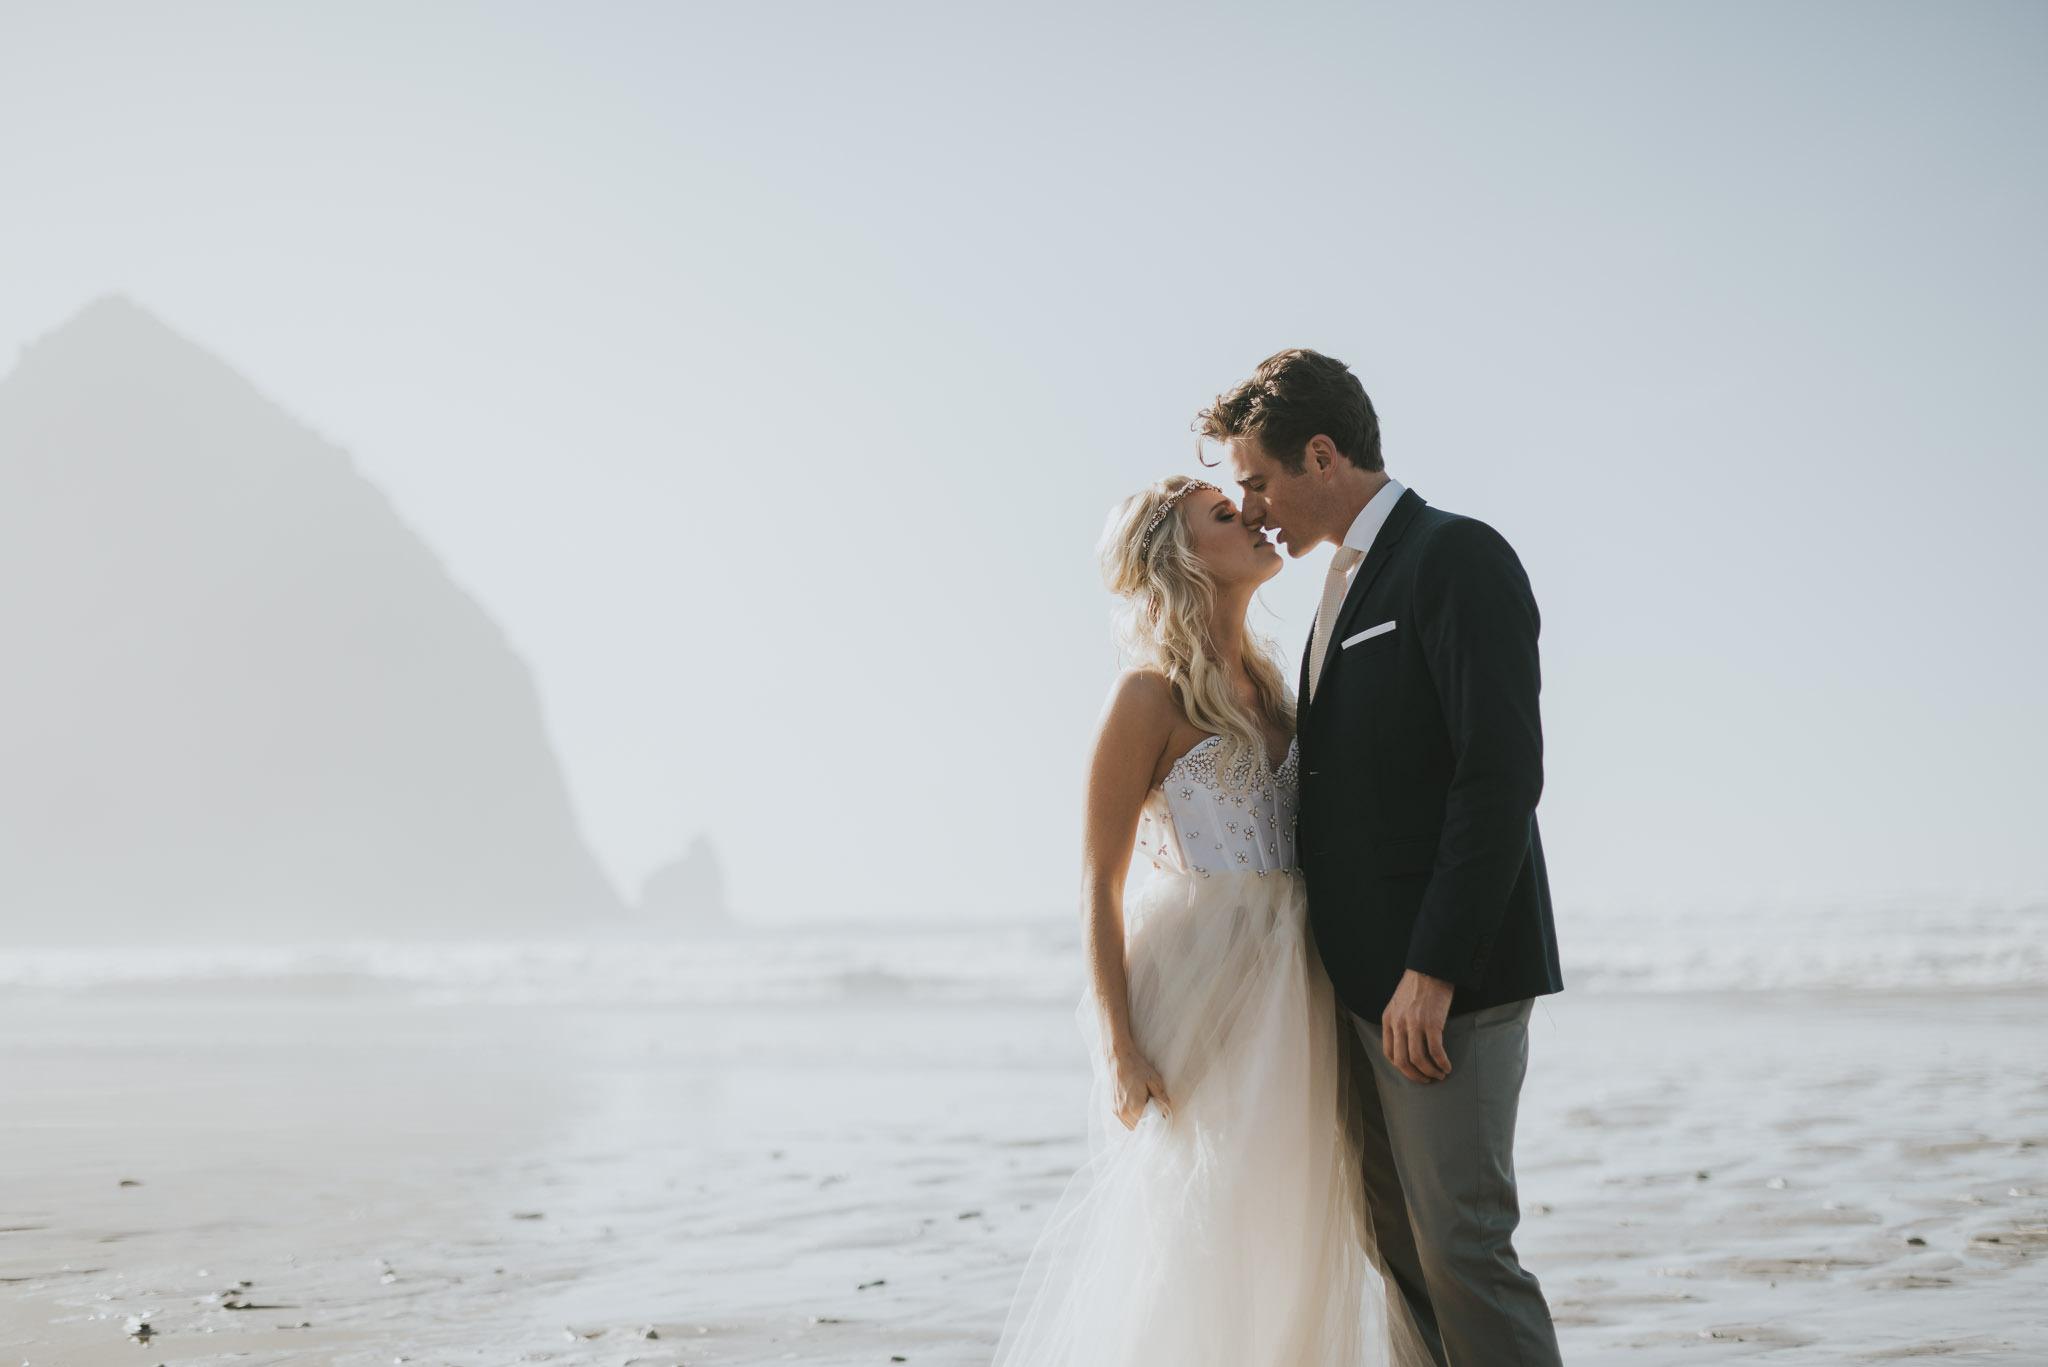 Cannon-Beach-Oregon-Adventure-elopement-engagement-photographer-haystack-rock-11